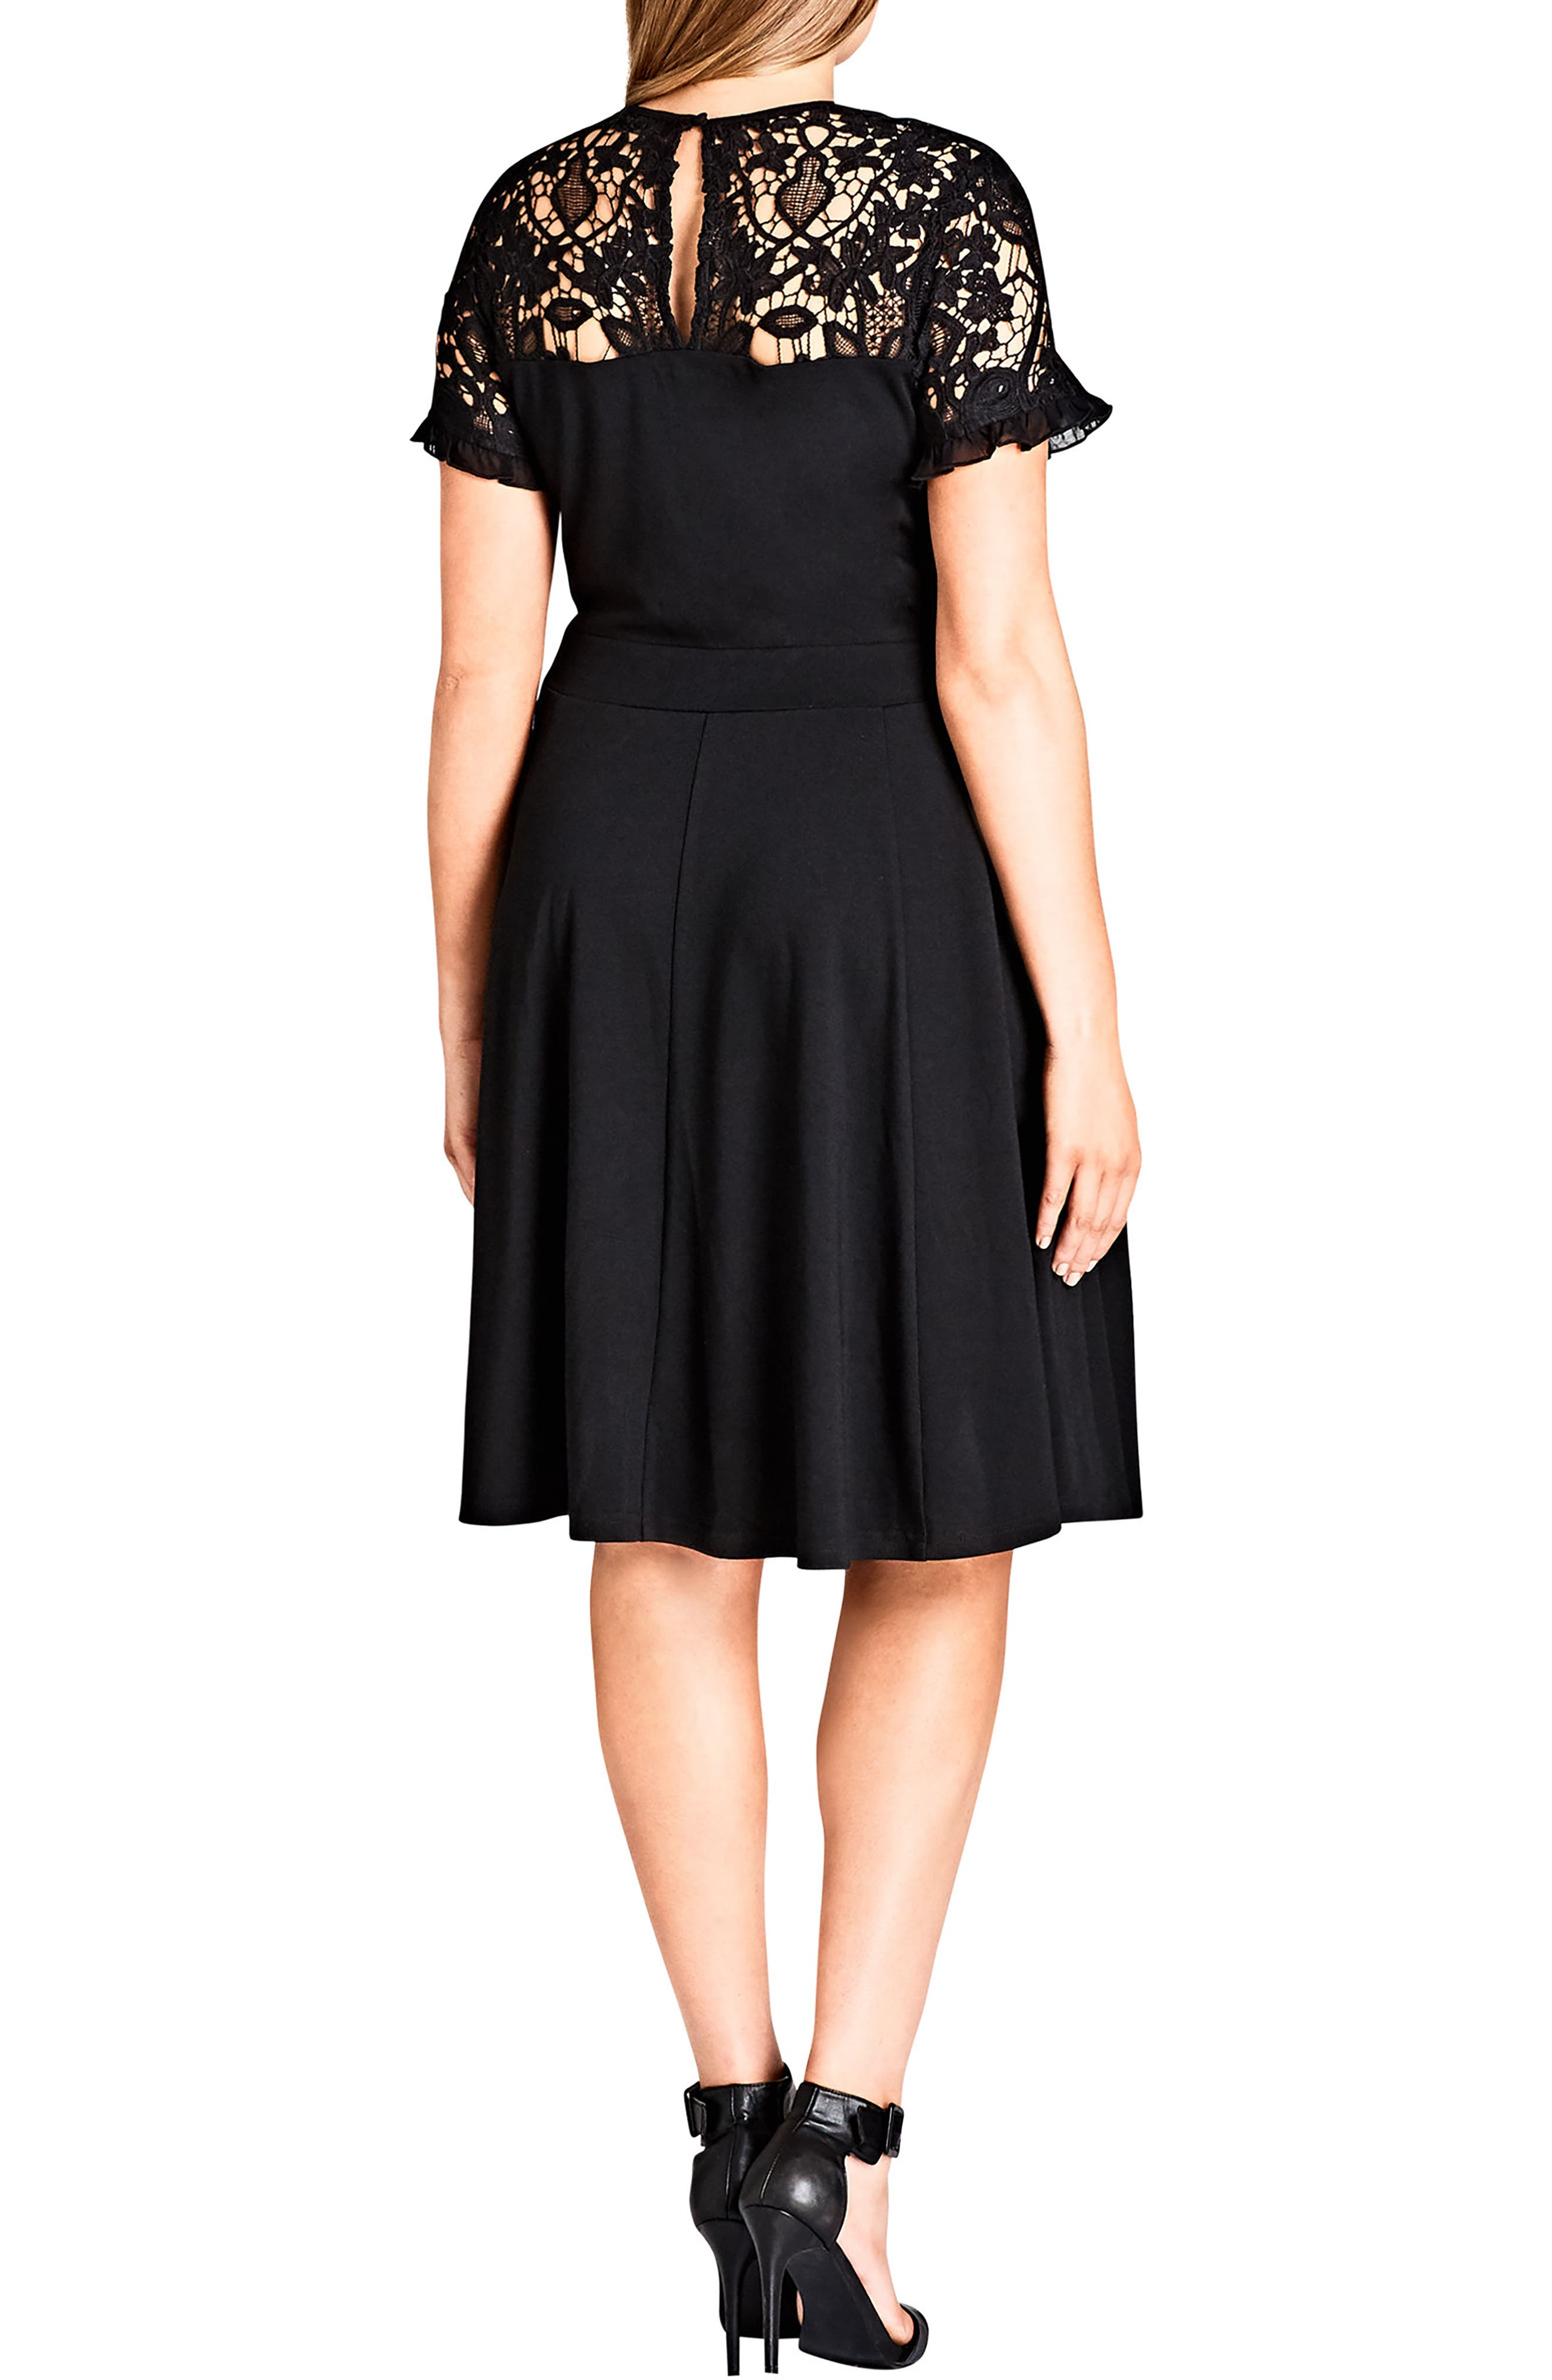 CITY CHIC,                             Dark Mistress Lace Yoke A-Line Dress,                             Alternate thumbnail 2, color,                             014